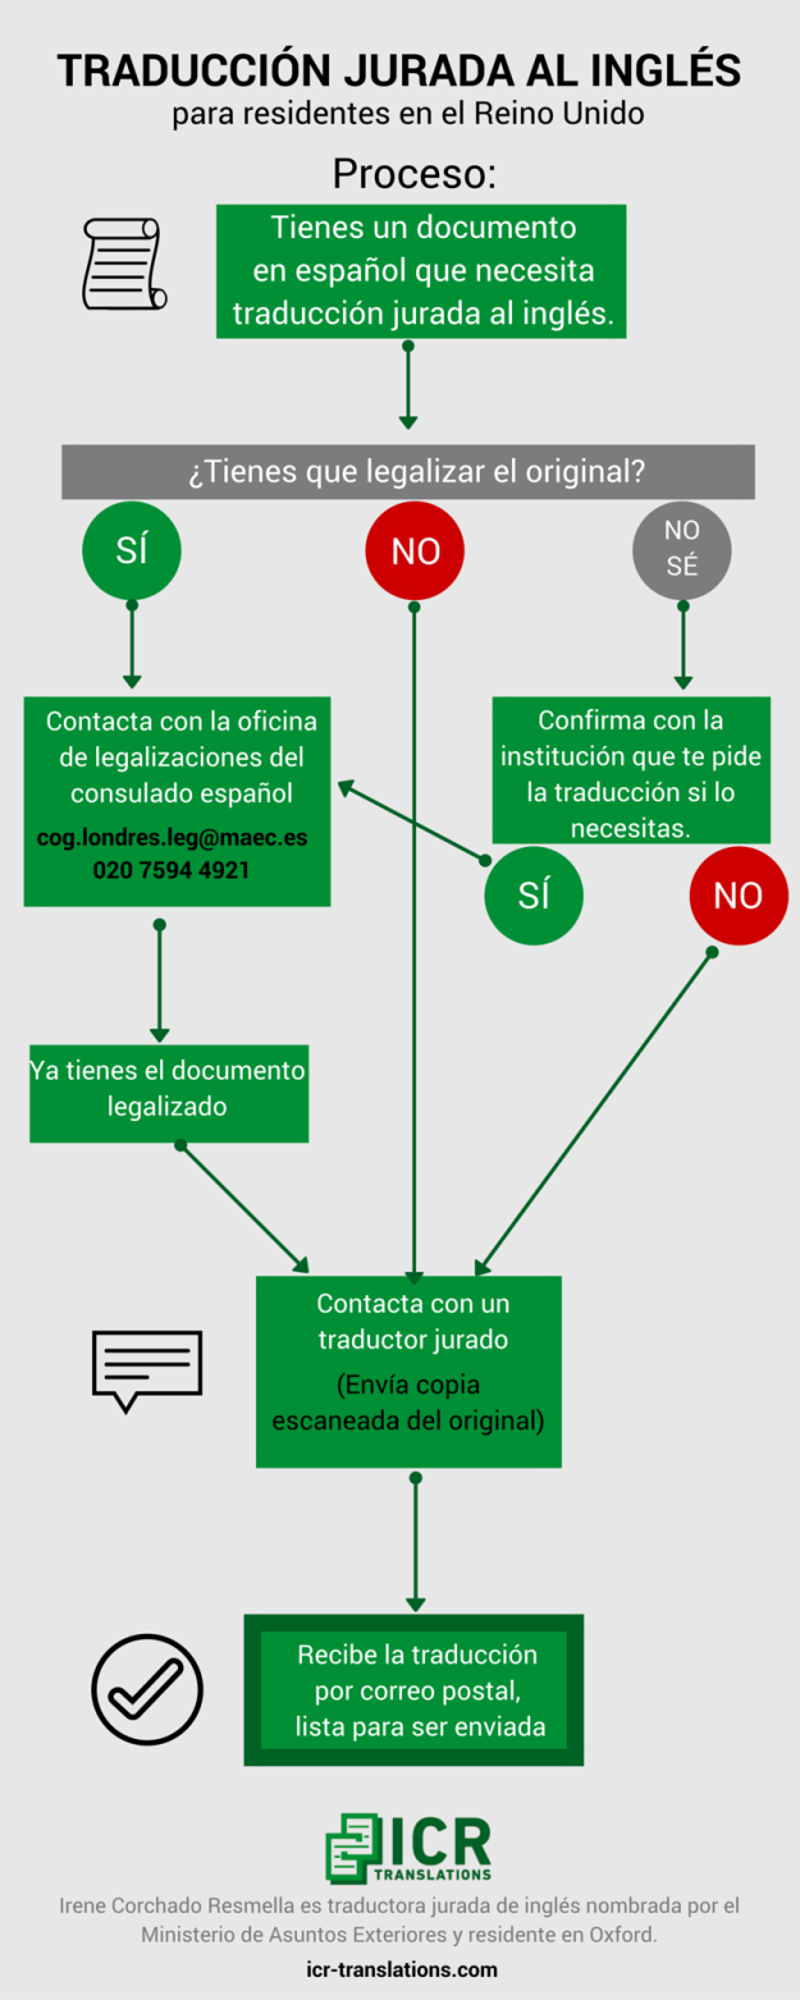 Traduccion jurada al ingles_proceso